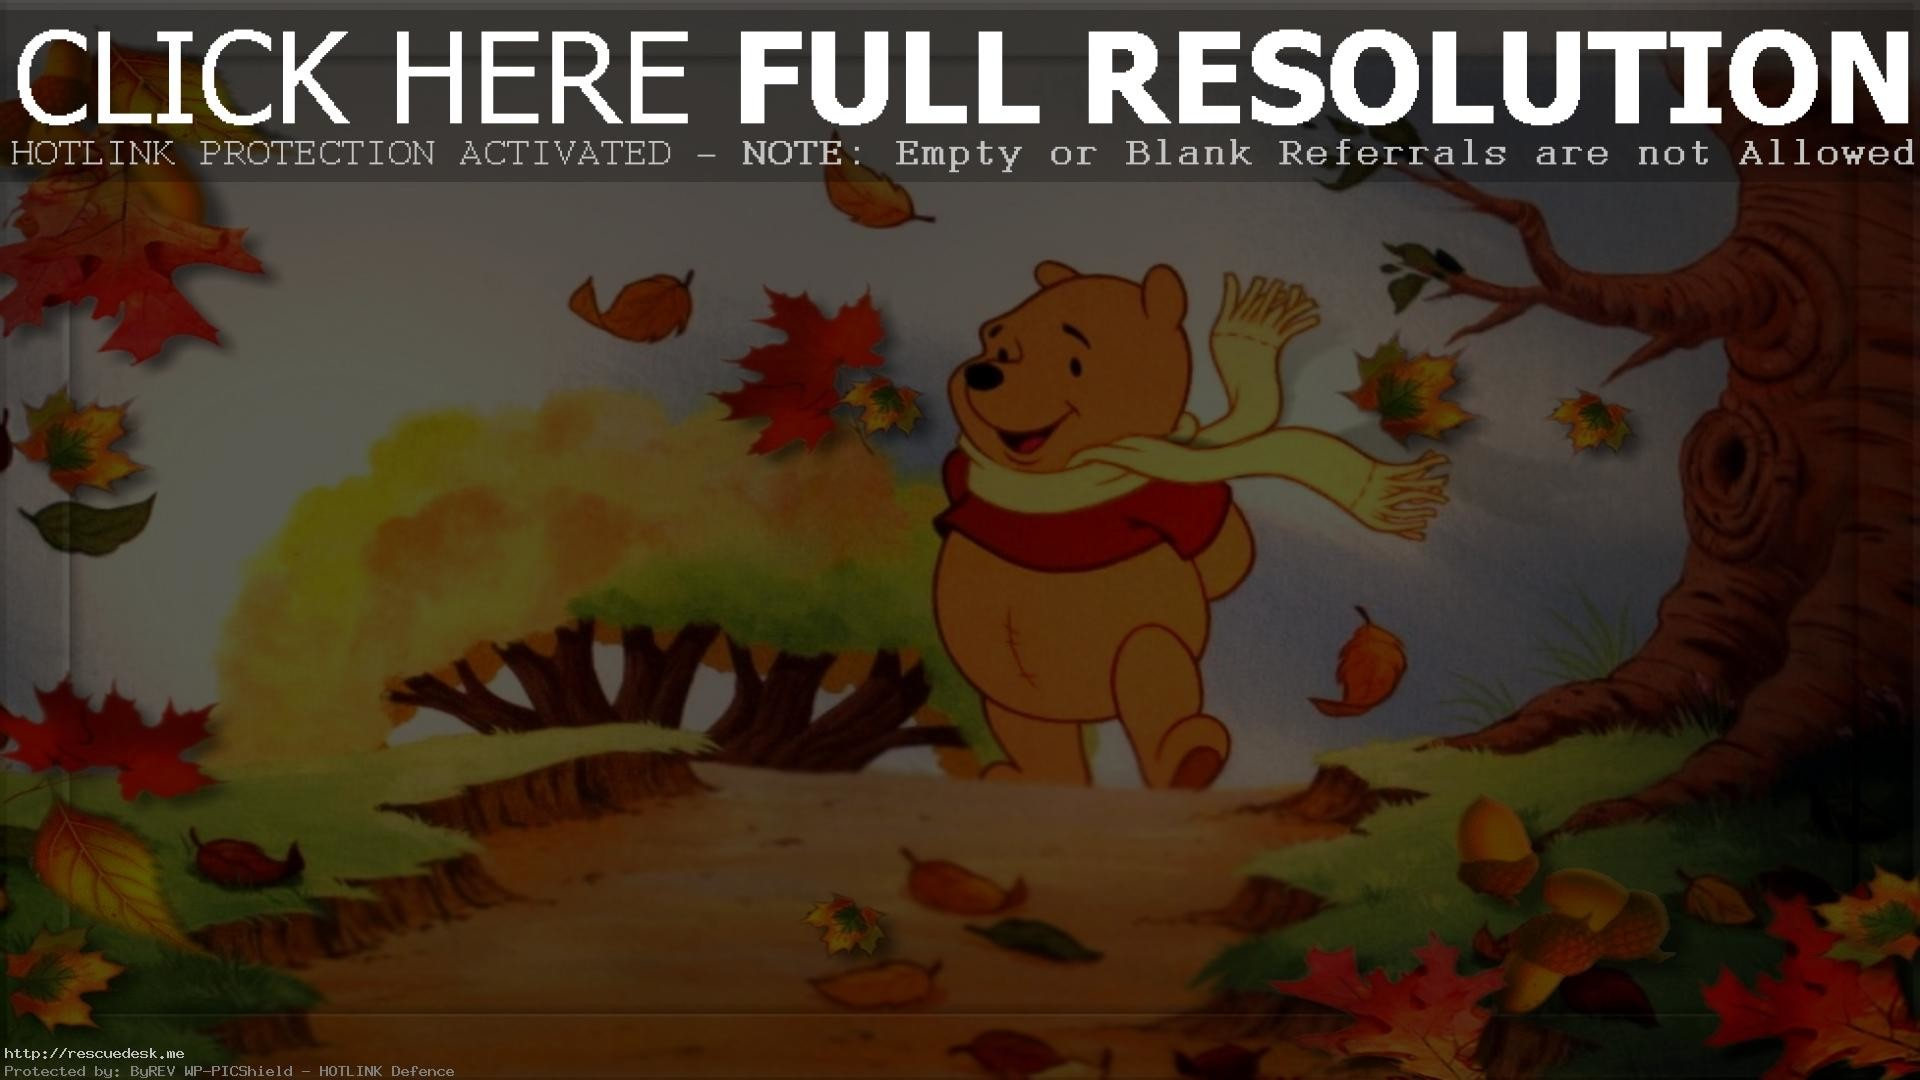 Disney Thanksgiving Wallpapers Background For Desktop Warren Street Tube Station 1920x1080 Wallpaper Teahub Io